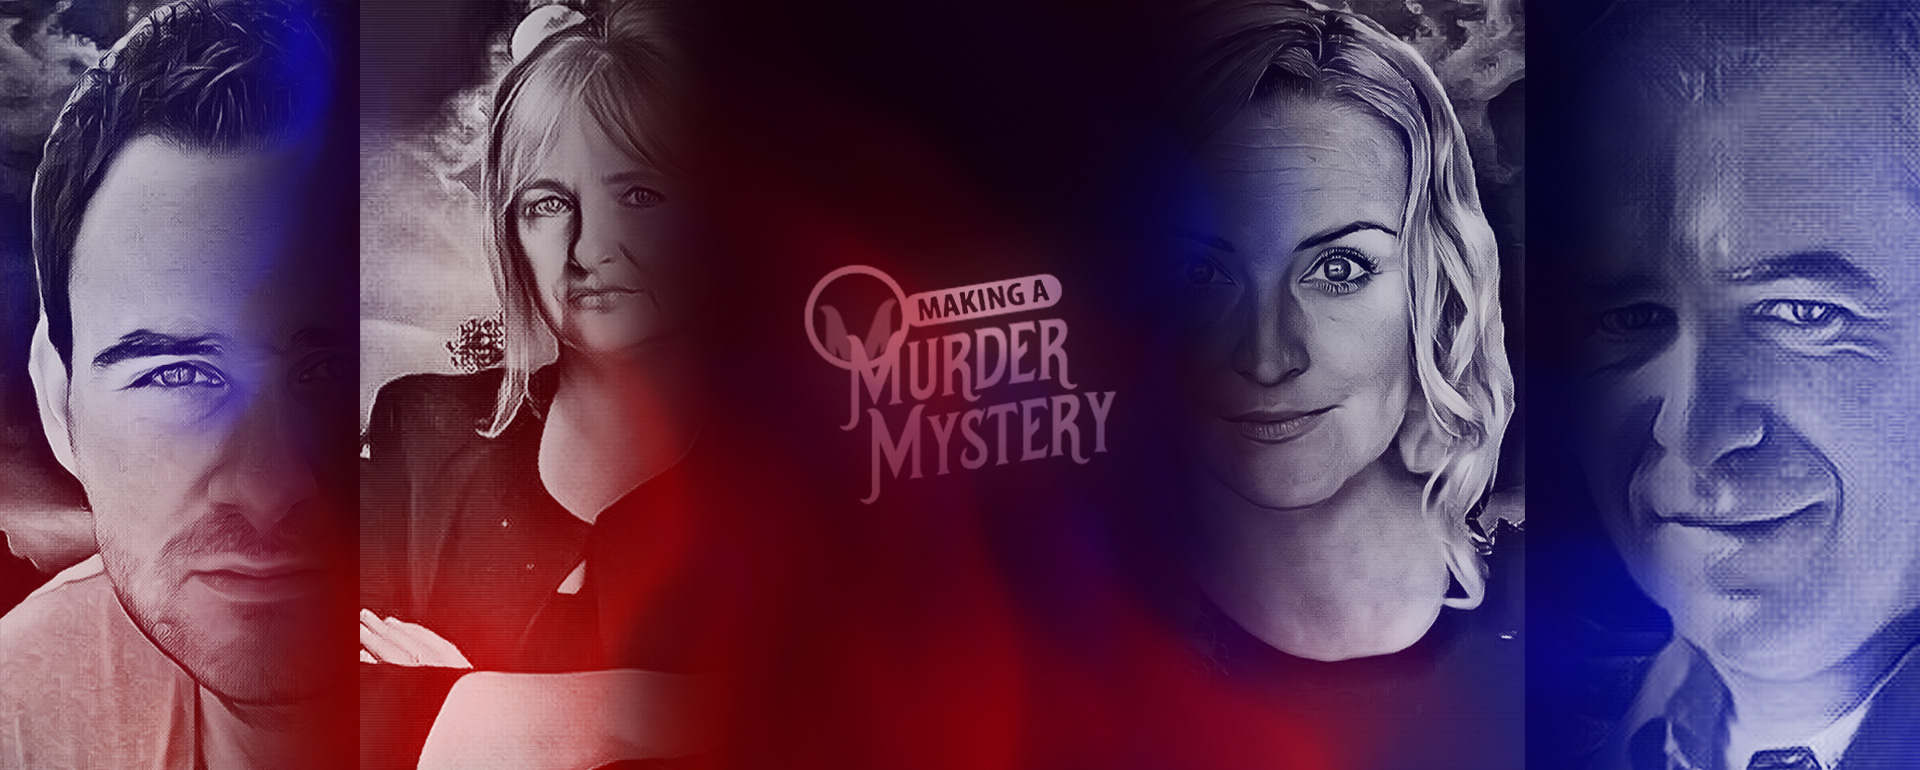 murder mystery banner